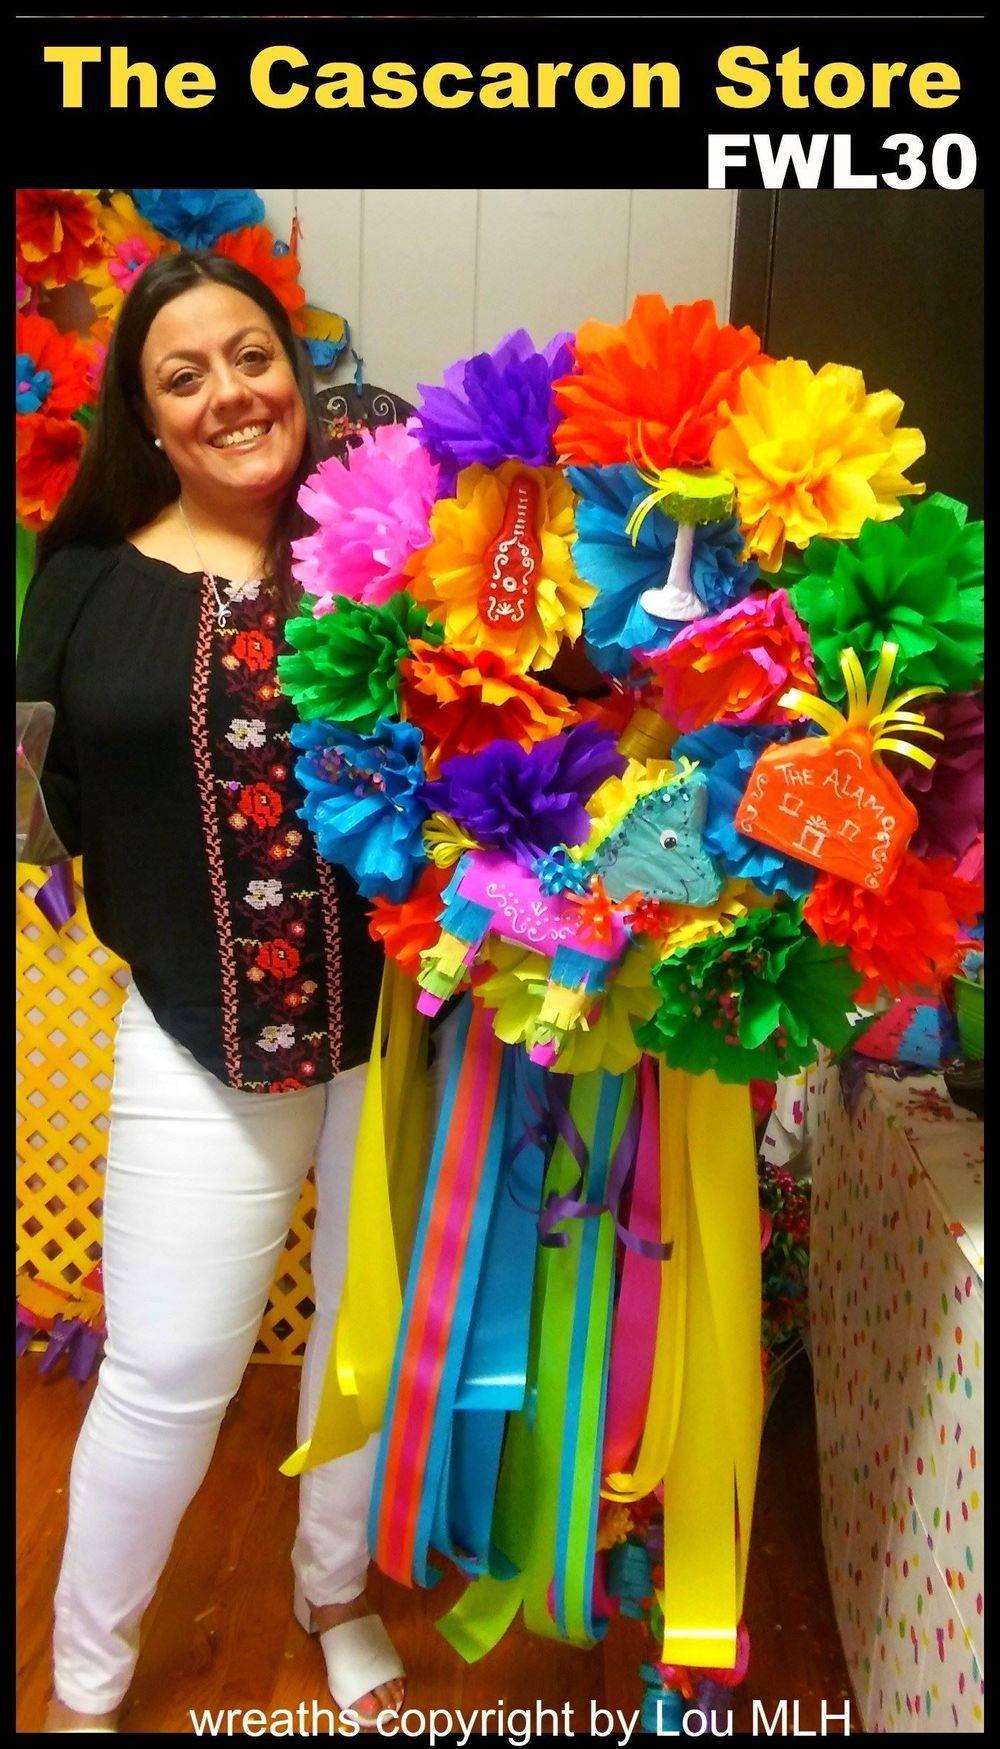 Fiesta Wreath at The Cascaron Store